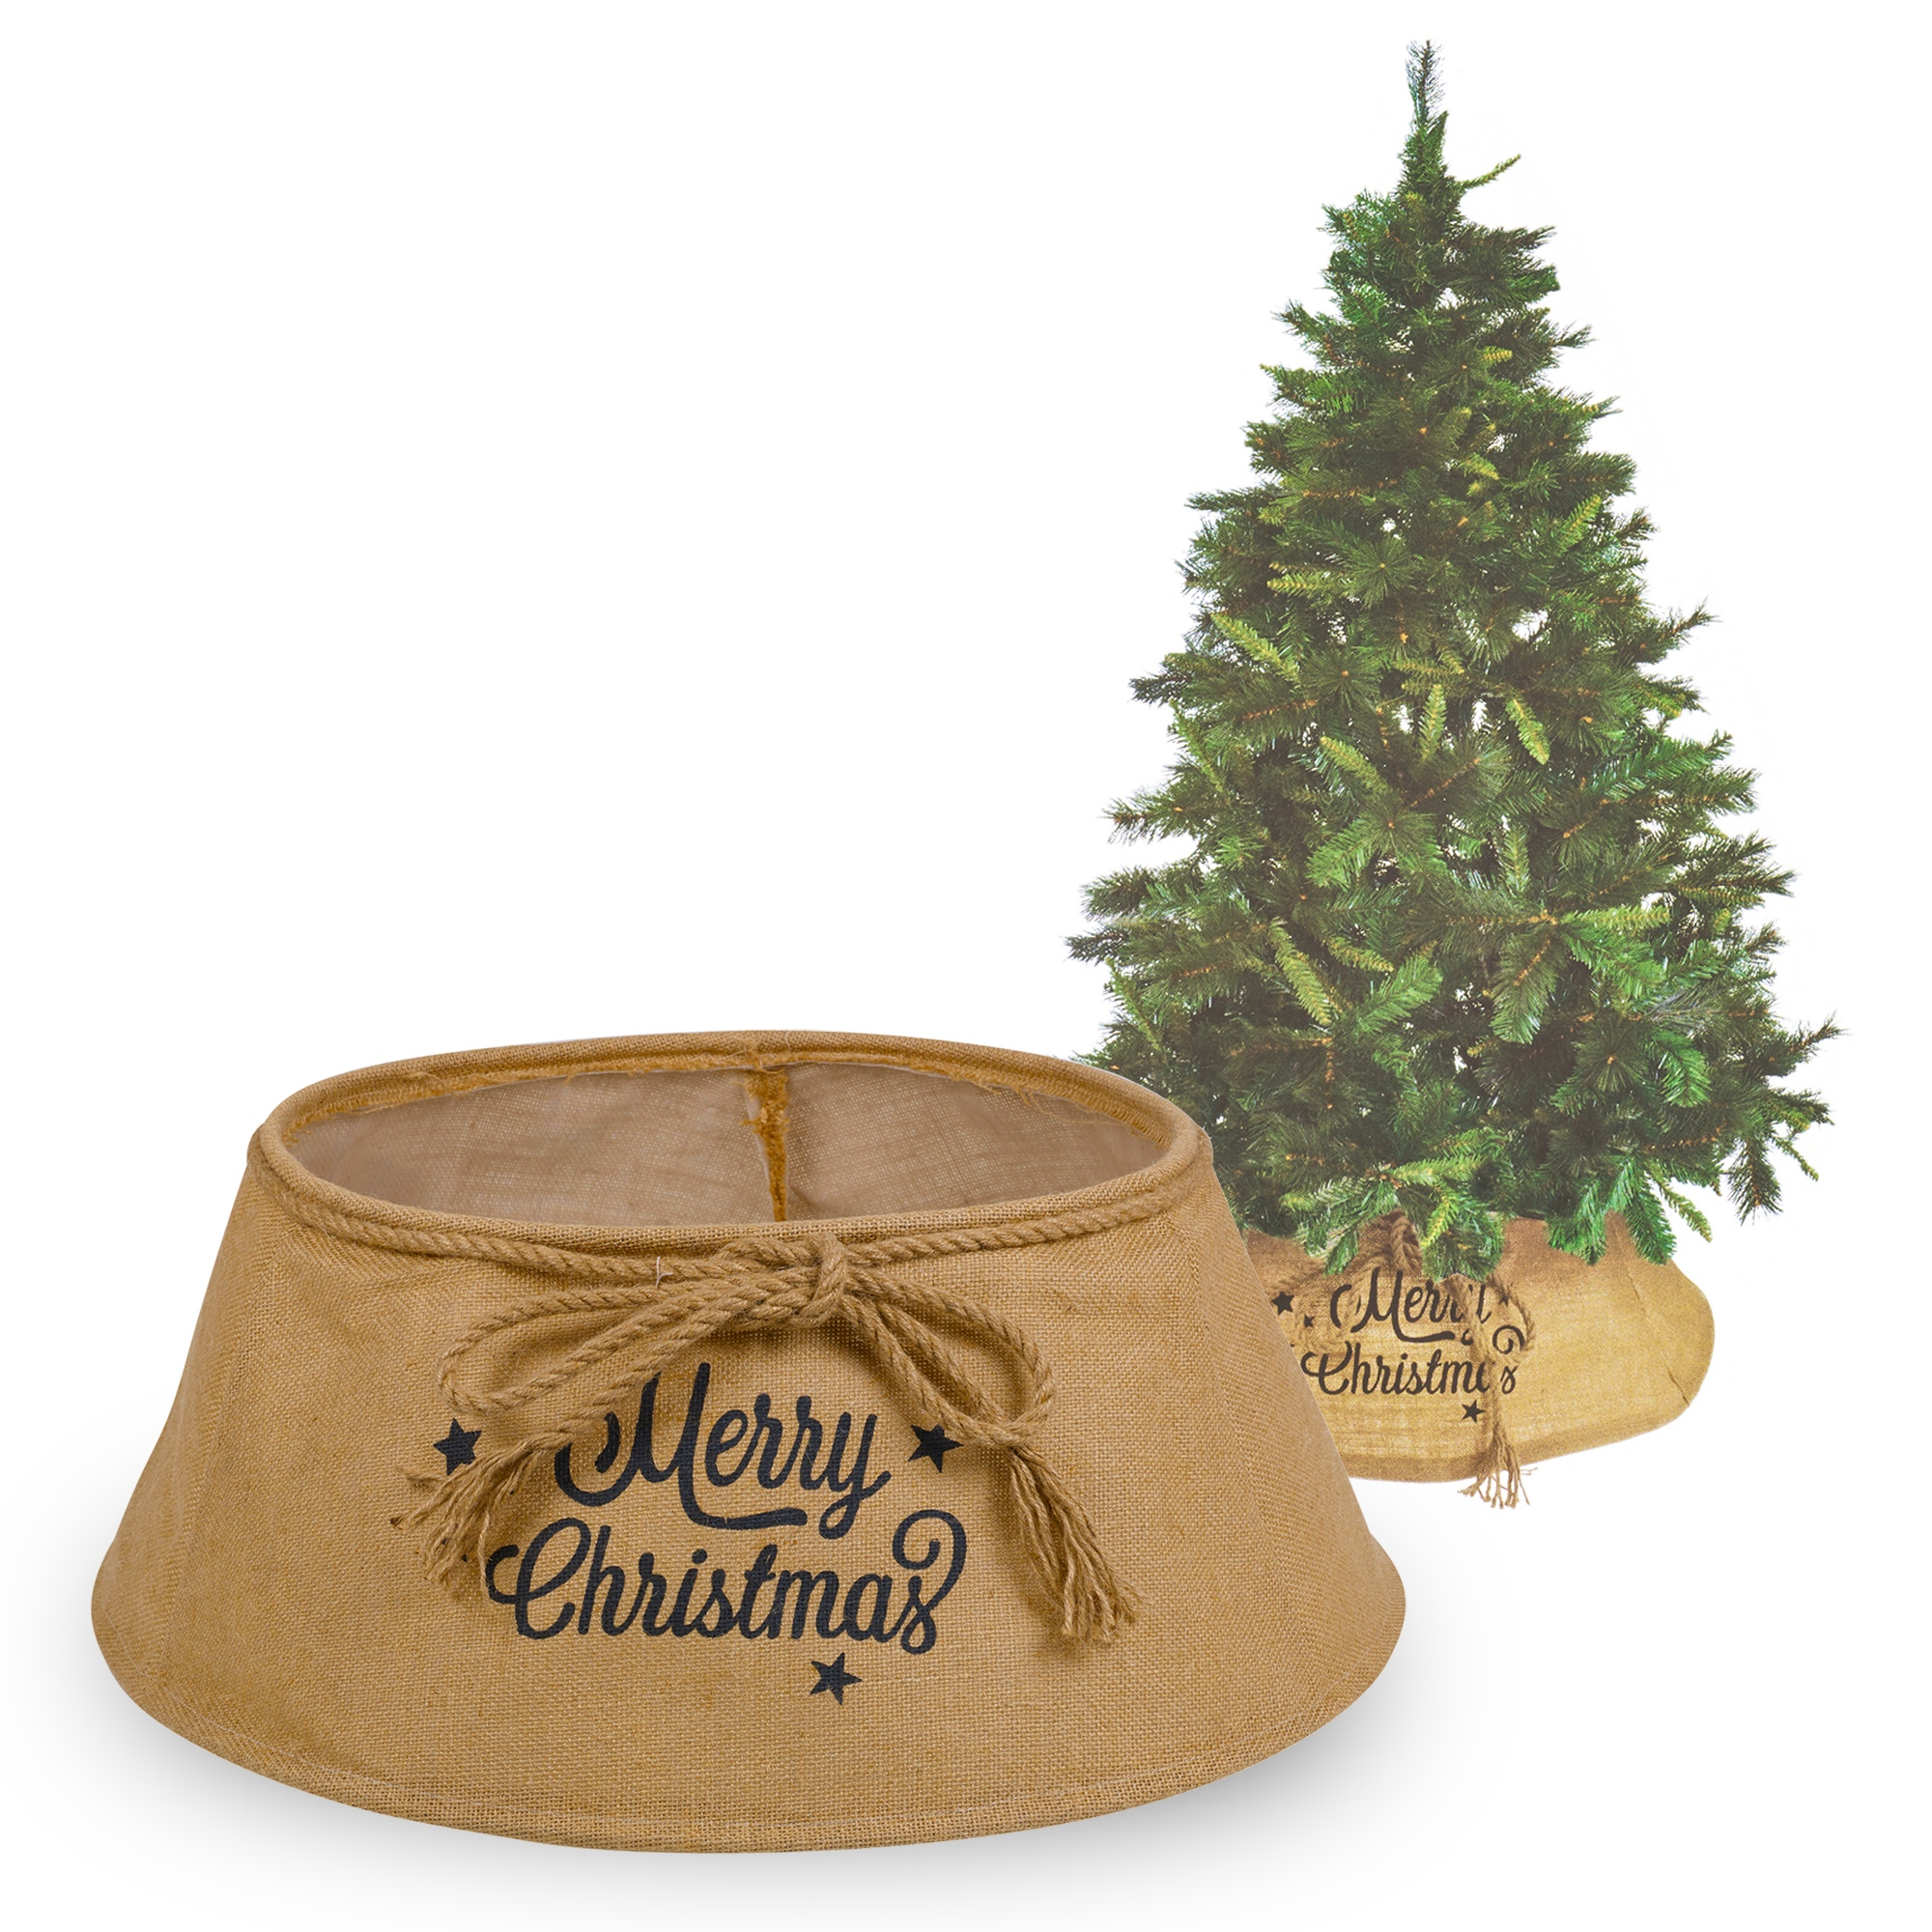 U00c1rbol De Navidad Falda Natural Arpillera Saco u0026#39;Feliz Navidadu0026#39;S Marru00f3n Decoraciu00f3n Fiesta | eBay